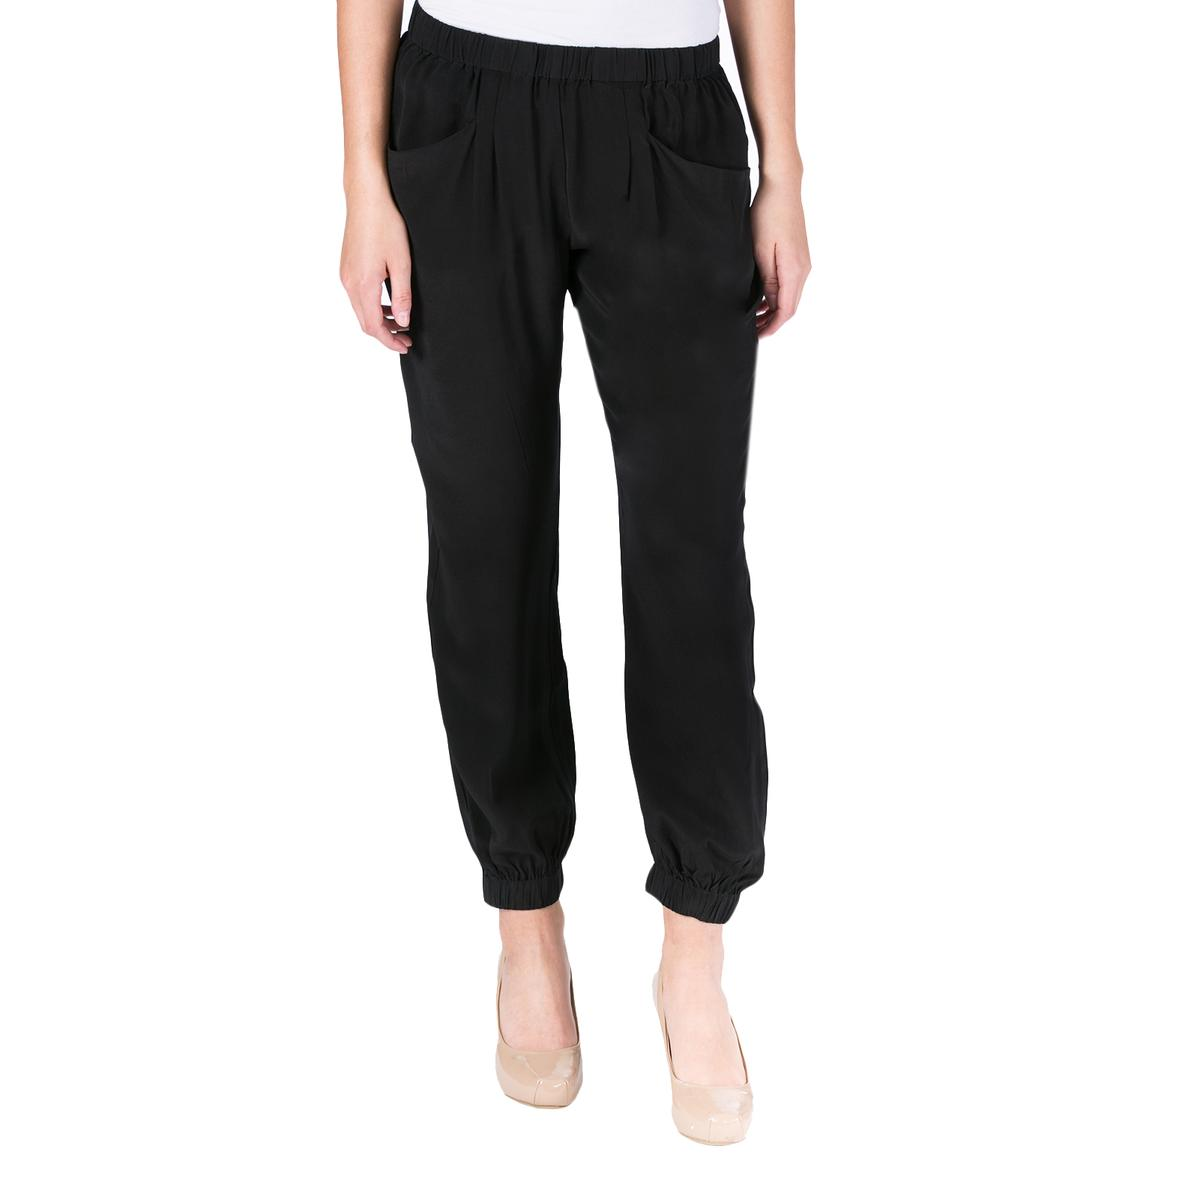 Model Tapered Pants Women - Pi Pants